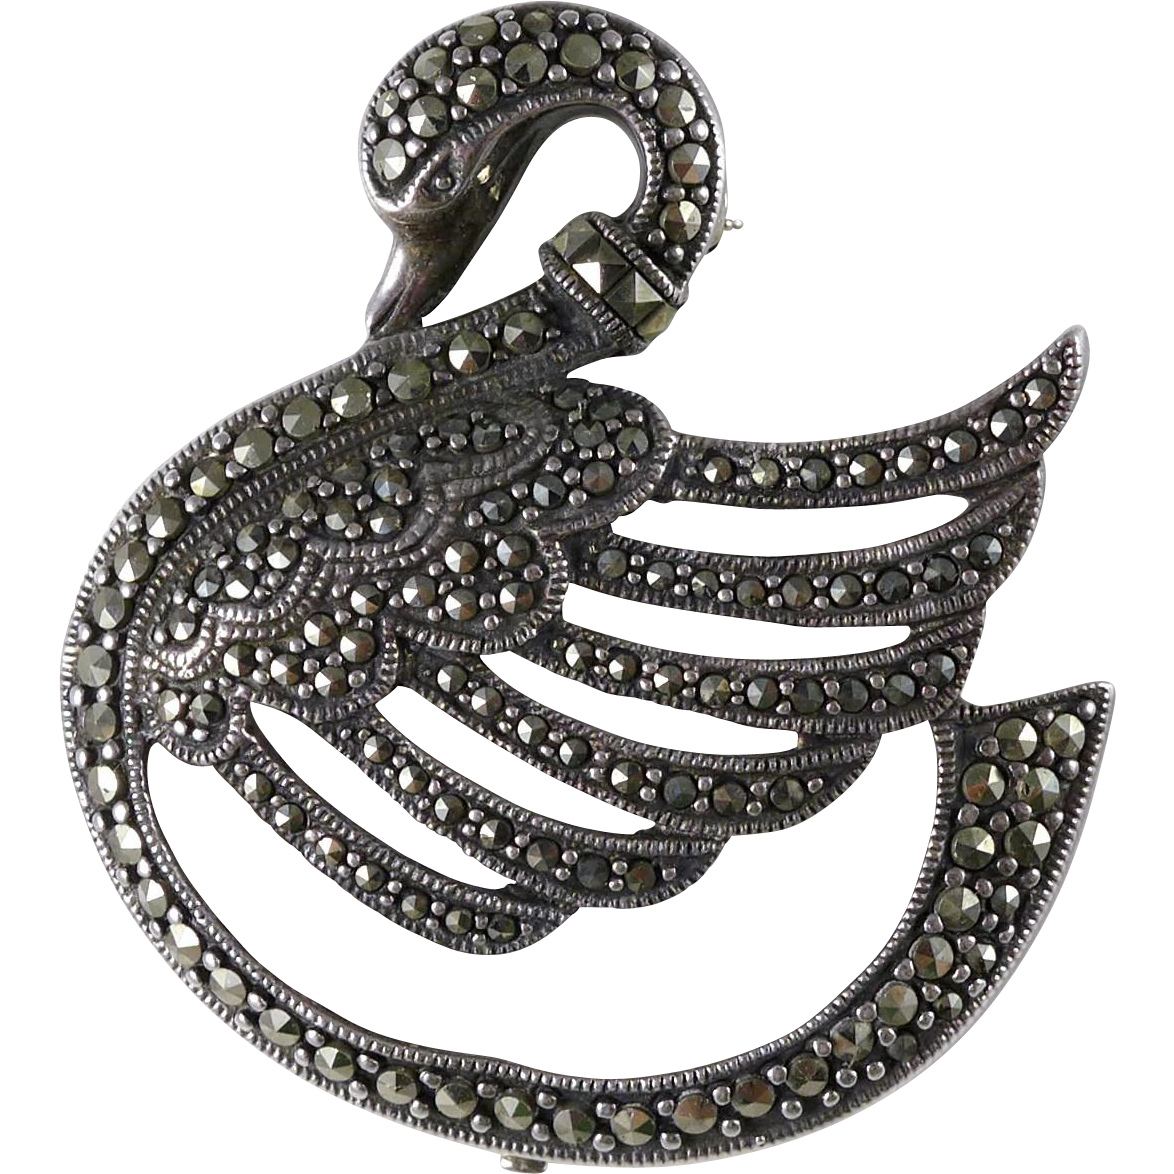 Vintage Sterling Silver Marcasite Swan Brooch / Pin